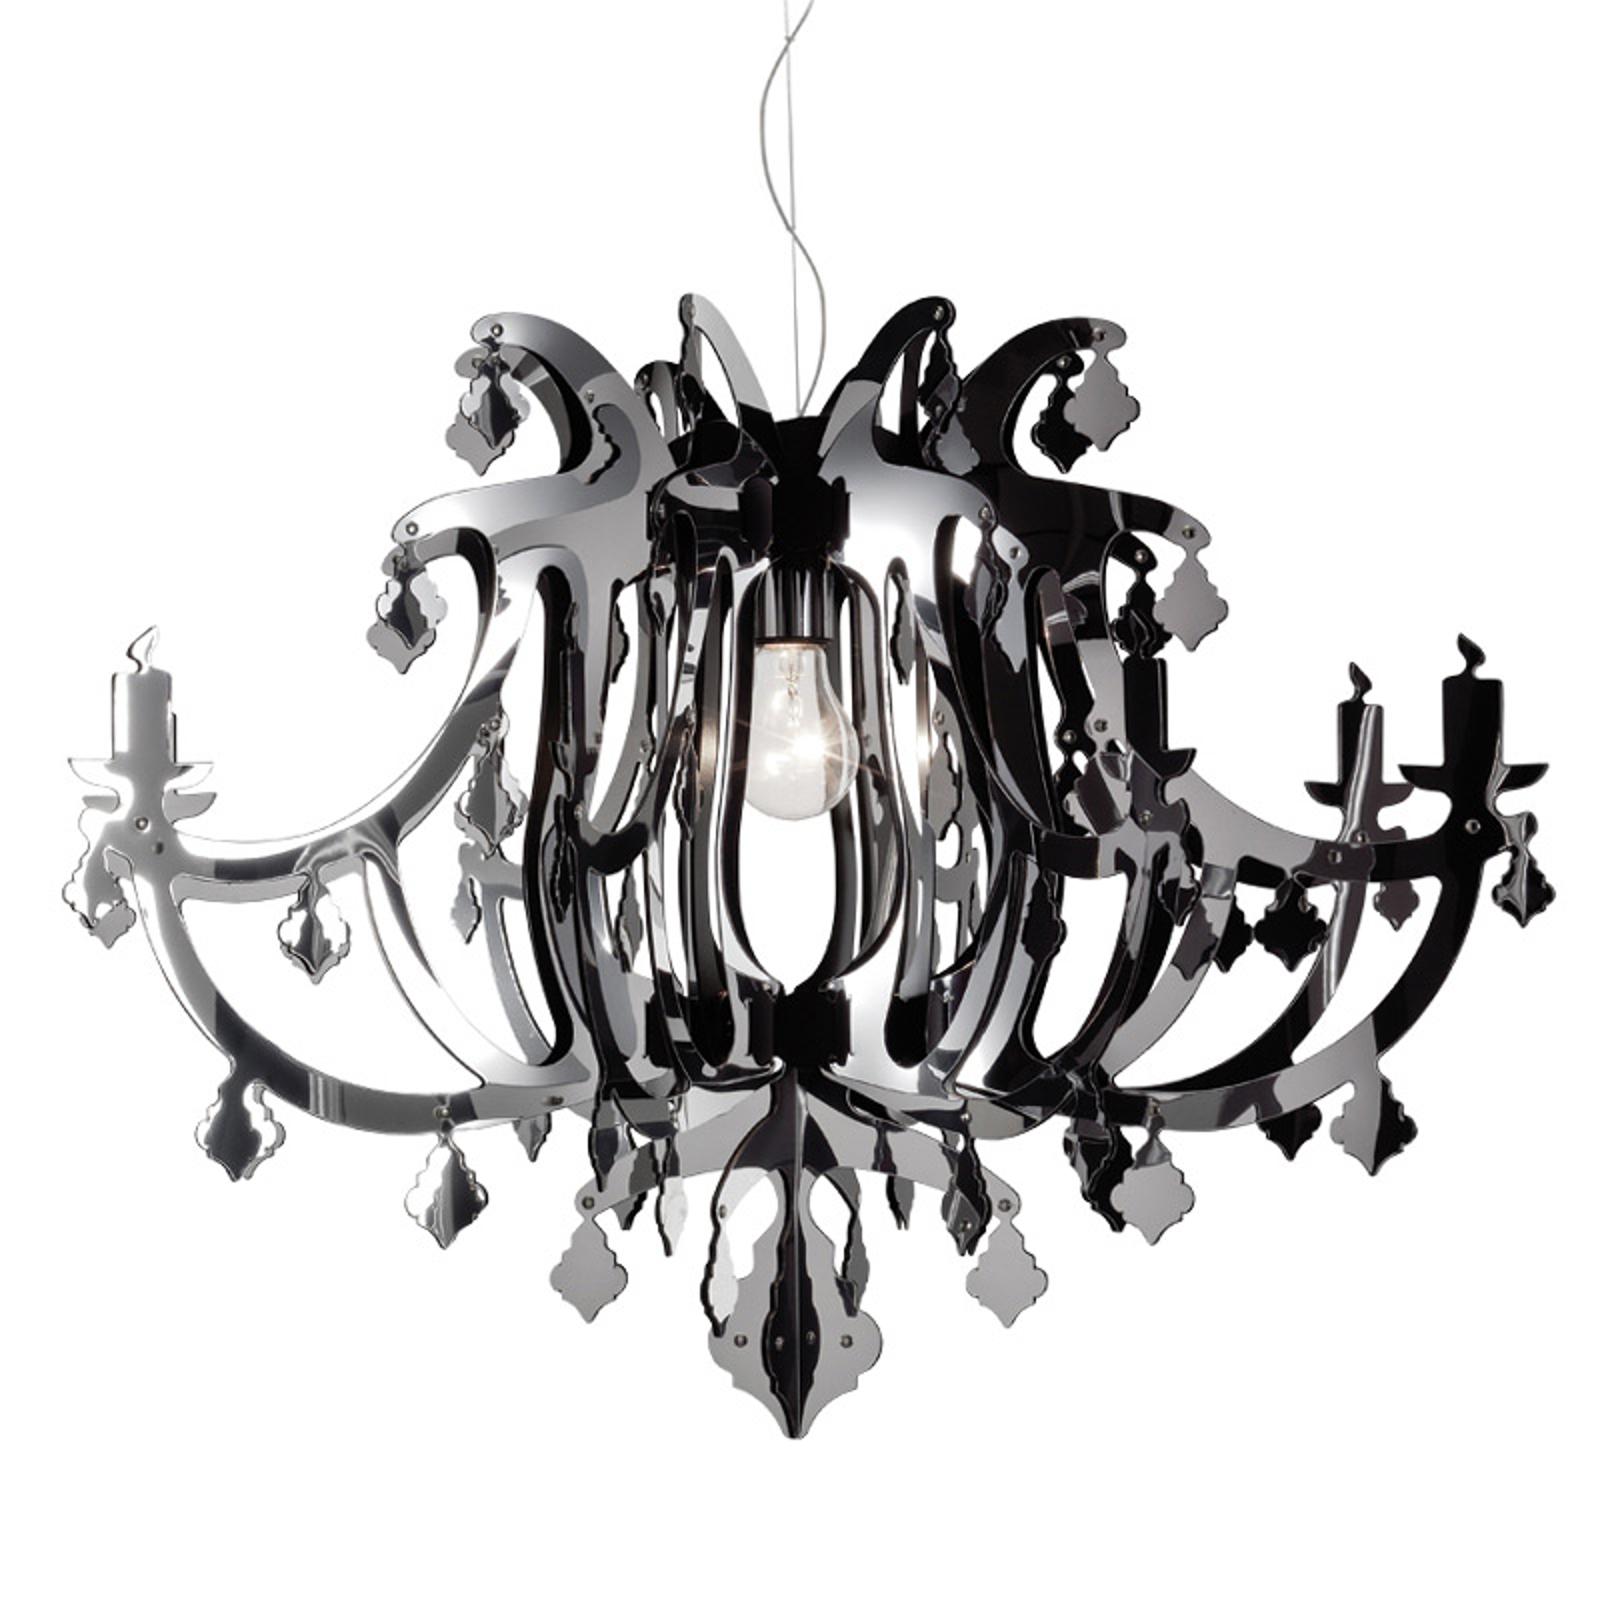 Srebrna designerska lampa wisząca GINETTA